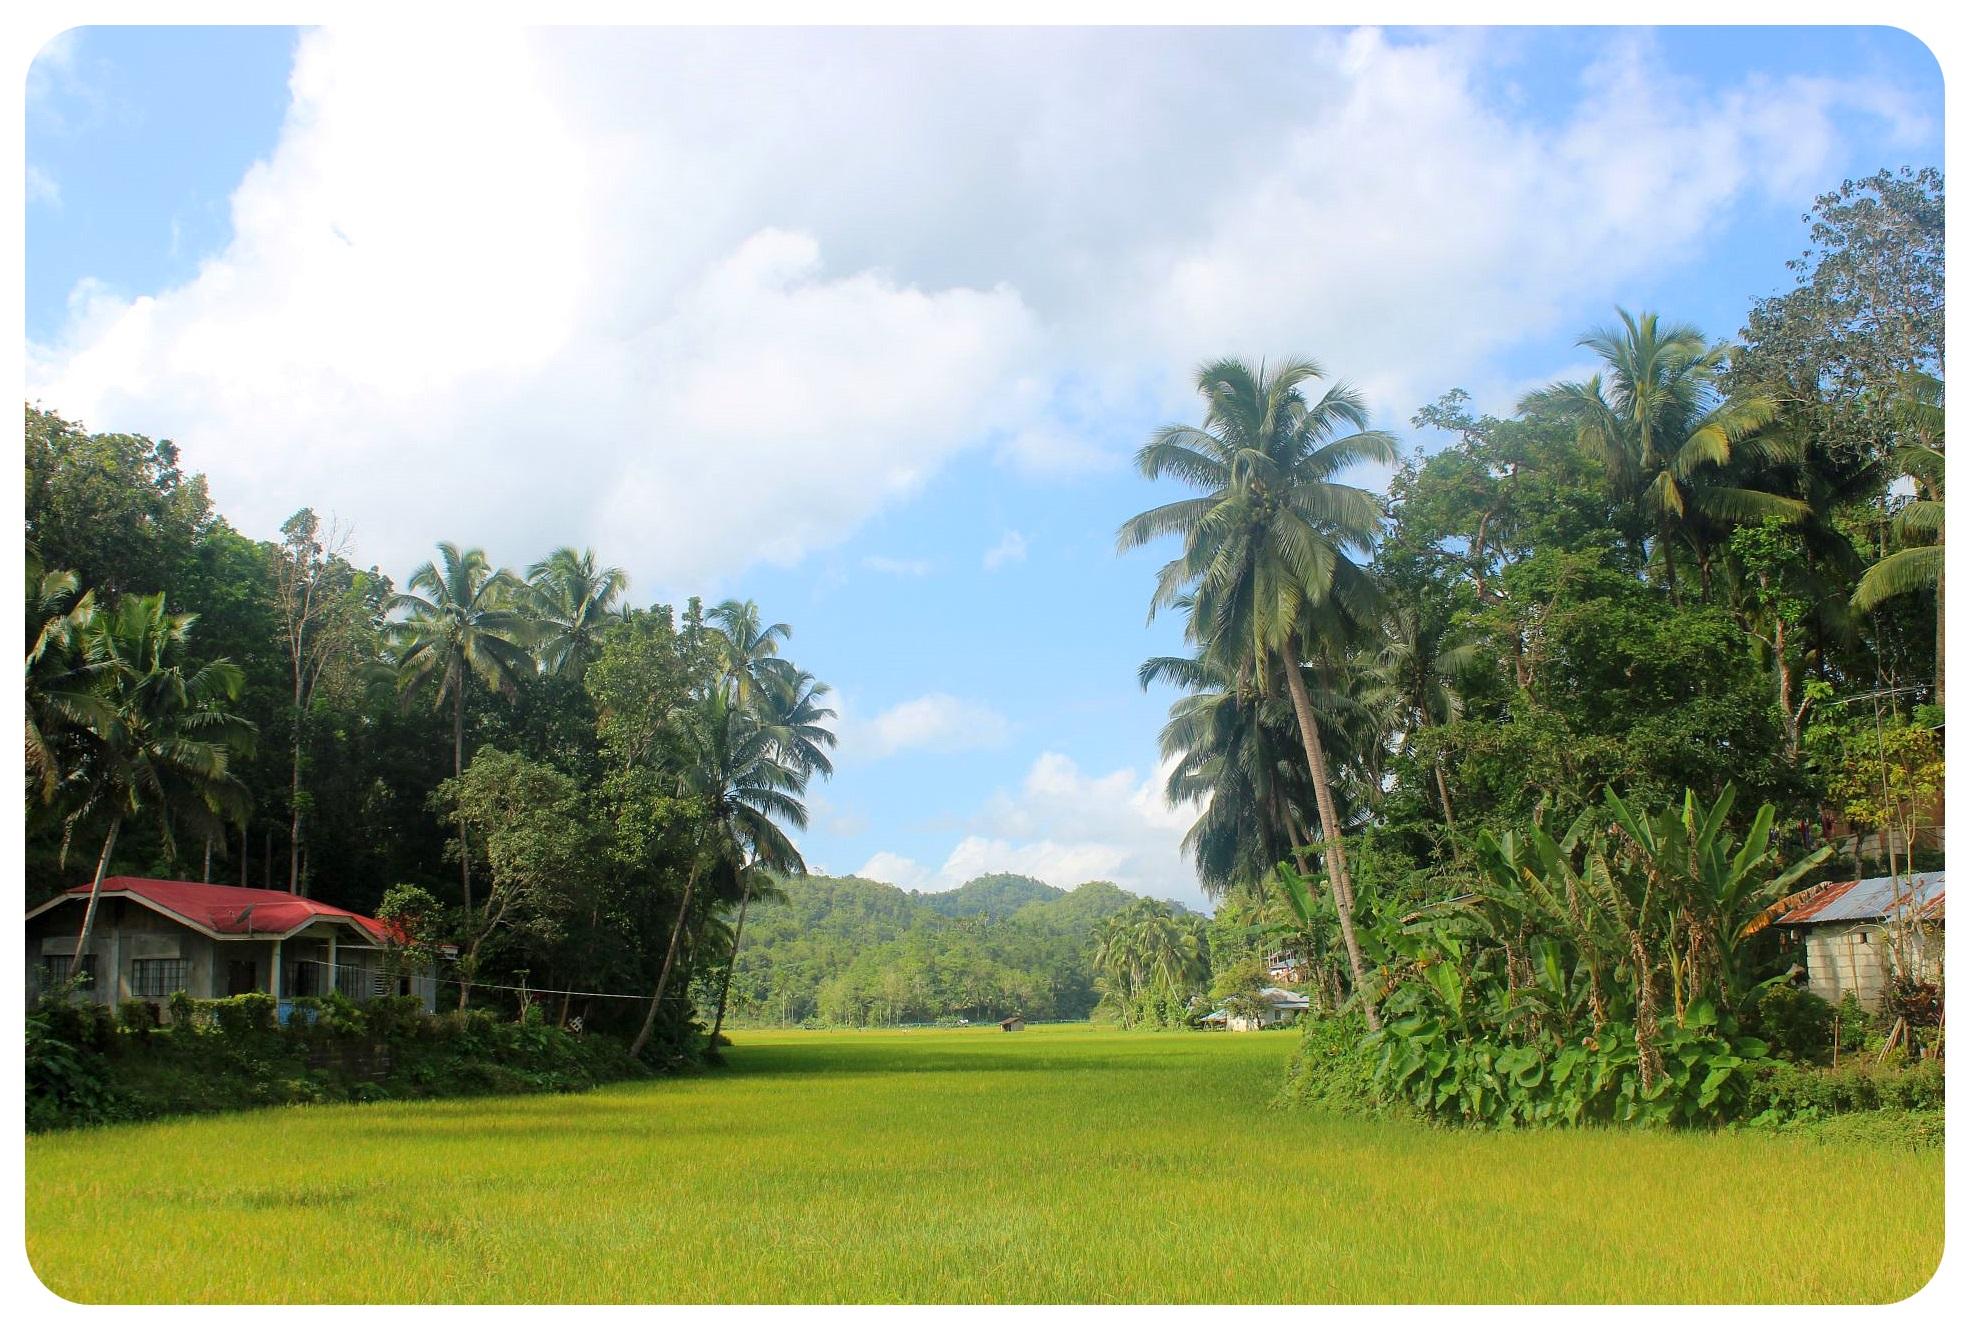 bohol scenery